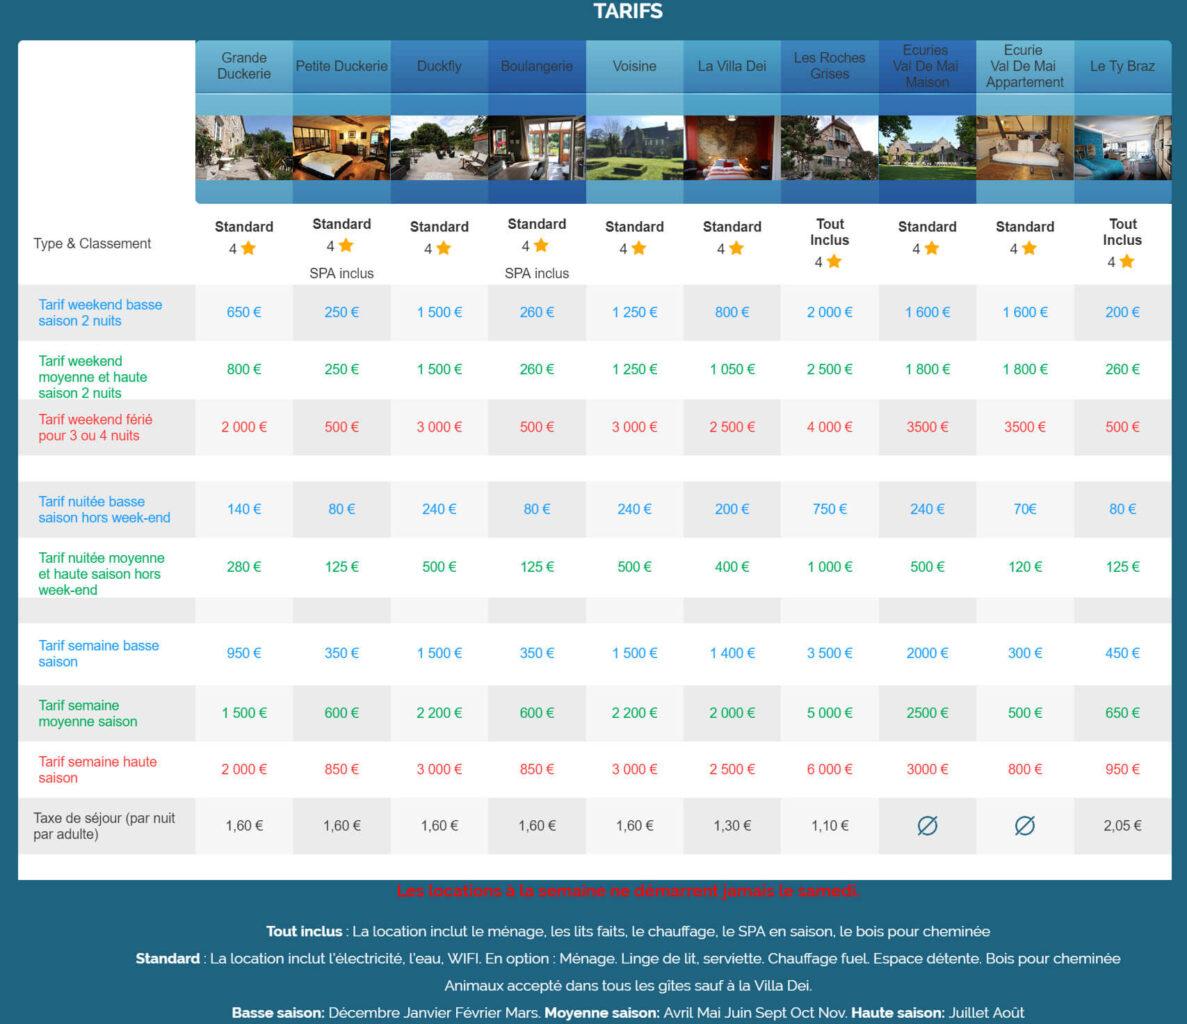 tarifs La clef Decamp - Homepage - Location de Gite La Clef Decamp - Laclefdecamp.fr